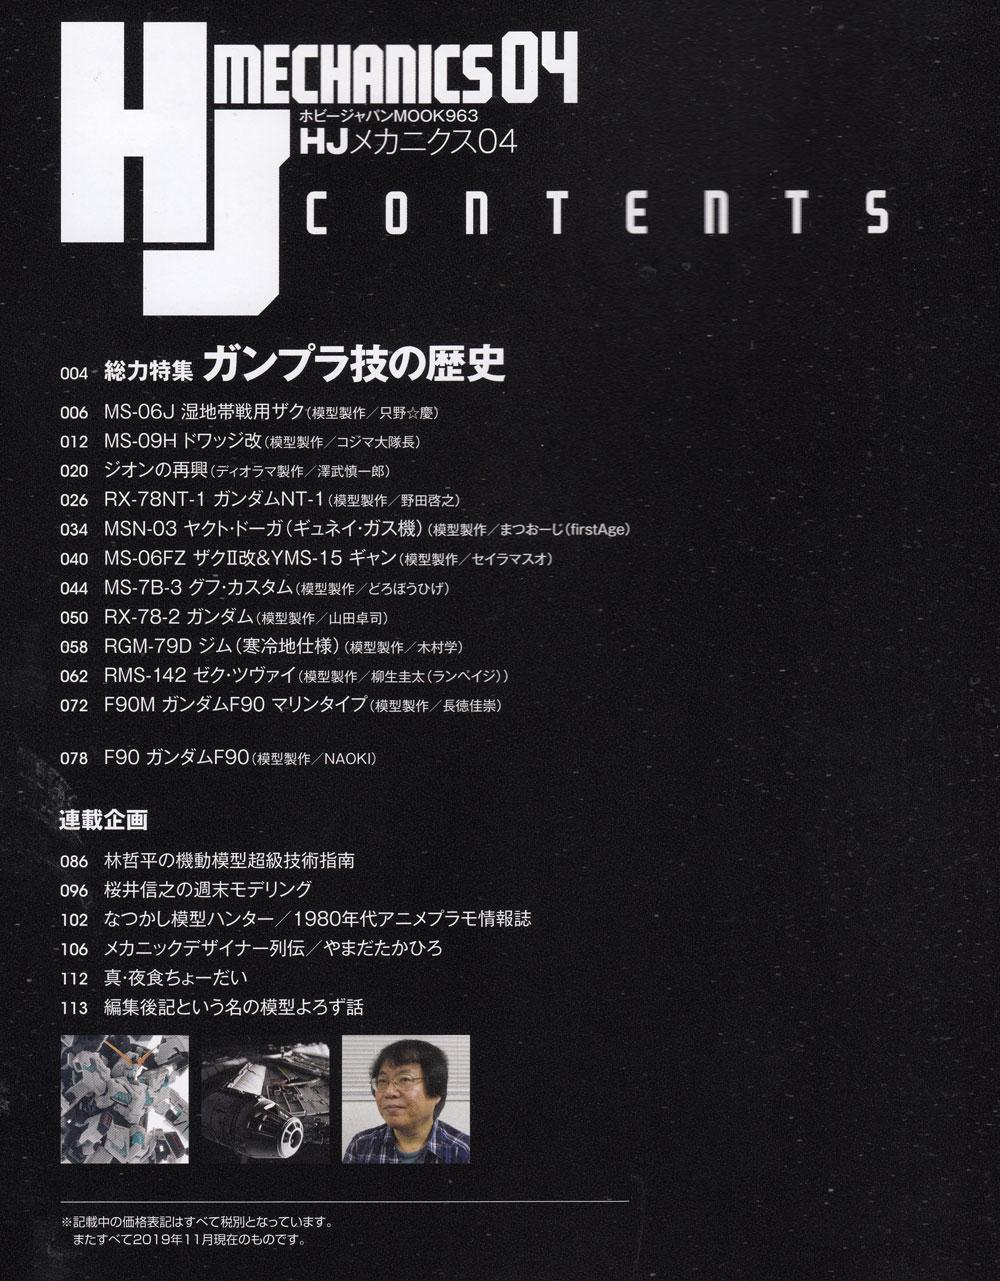 HJ メカニクス 04本(ホビージャパンHJメカニクスNo.68150-63)商品画像_1